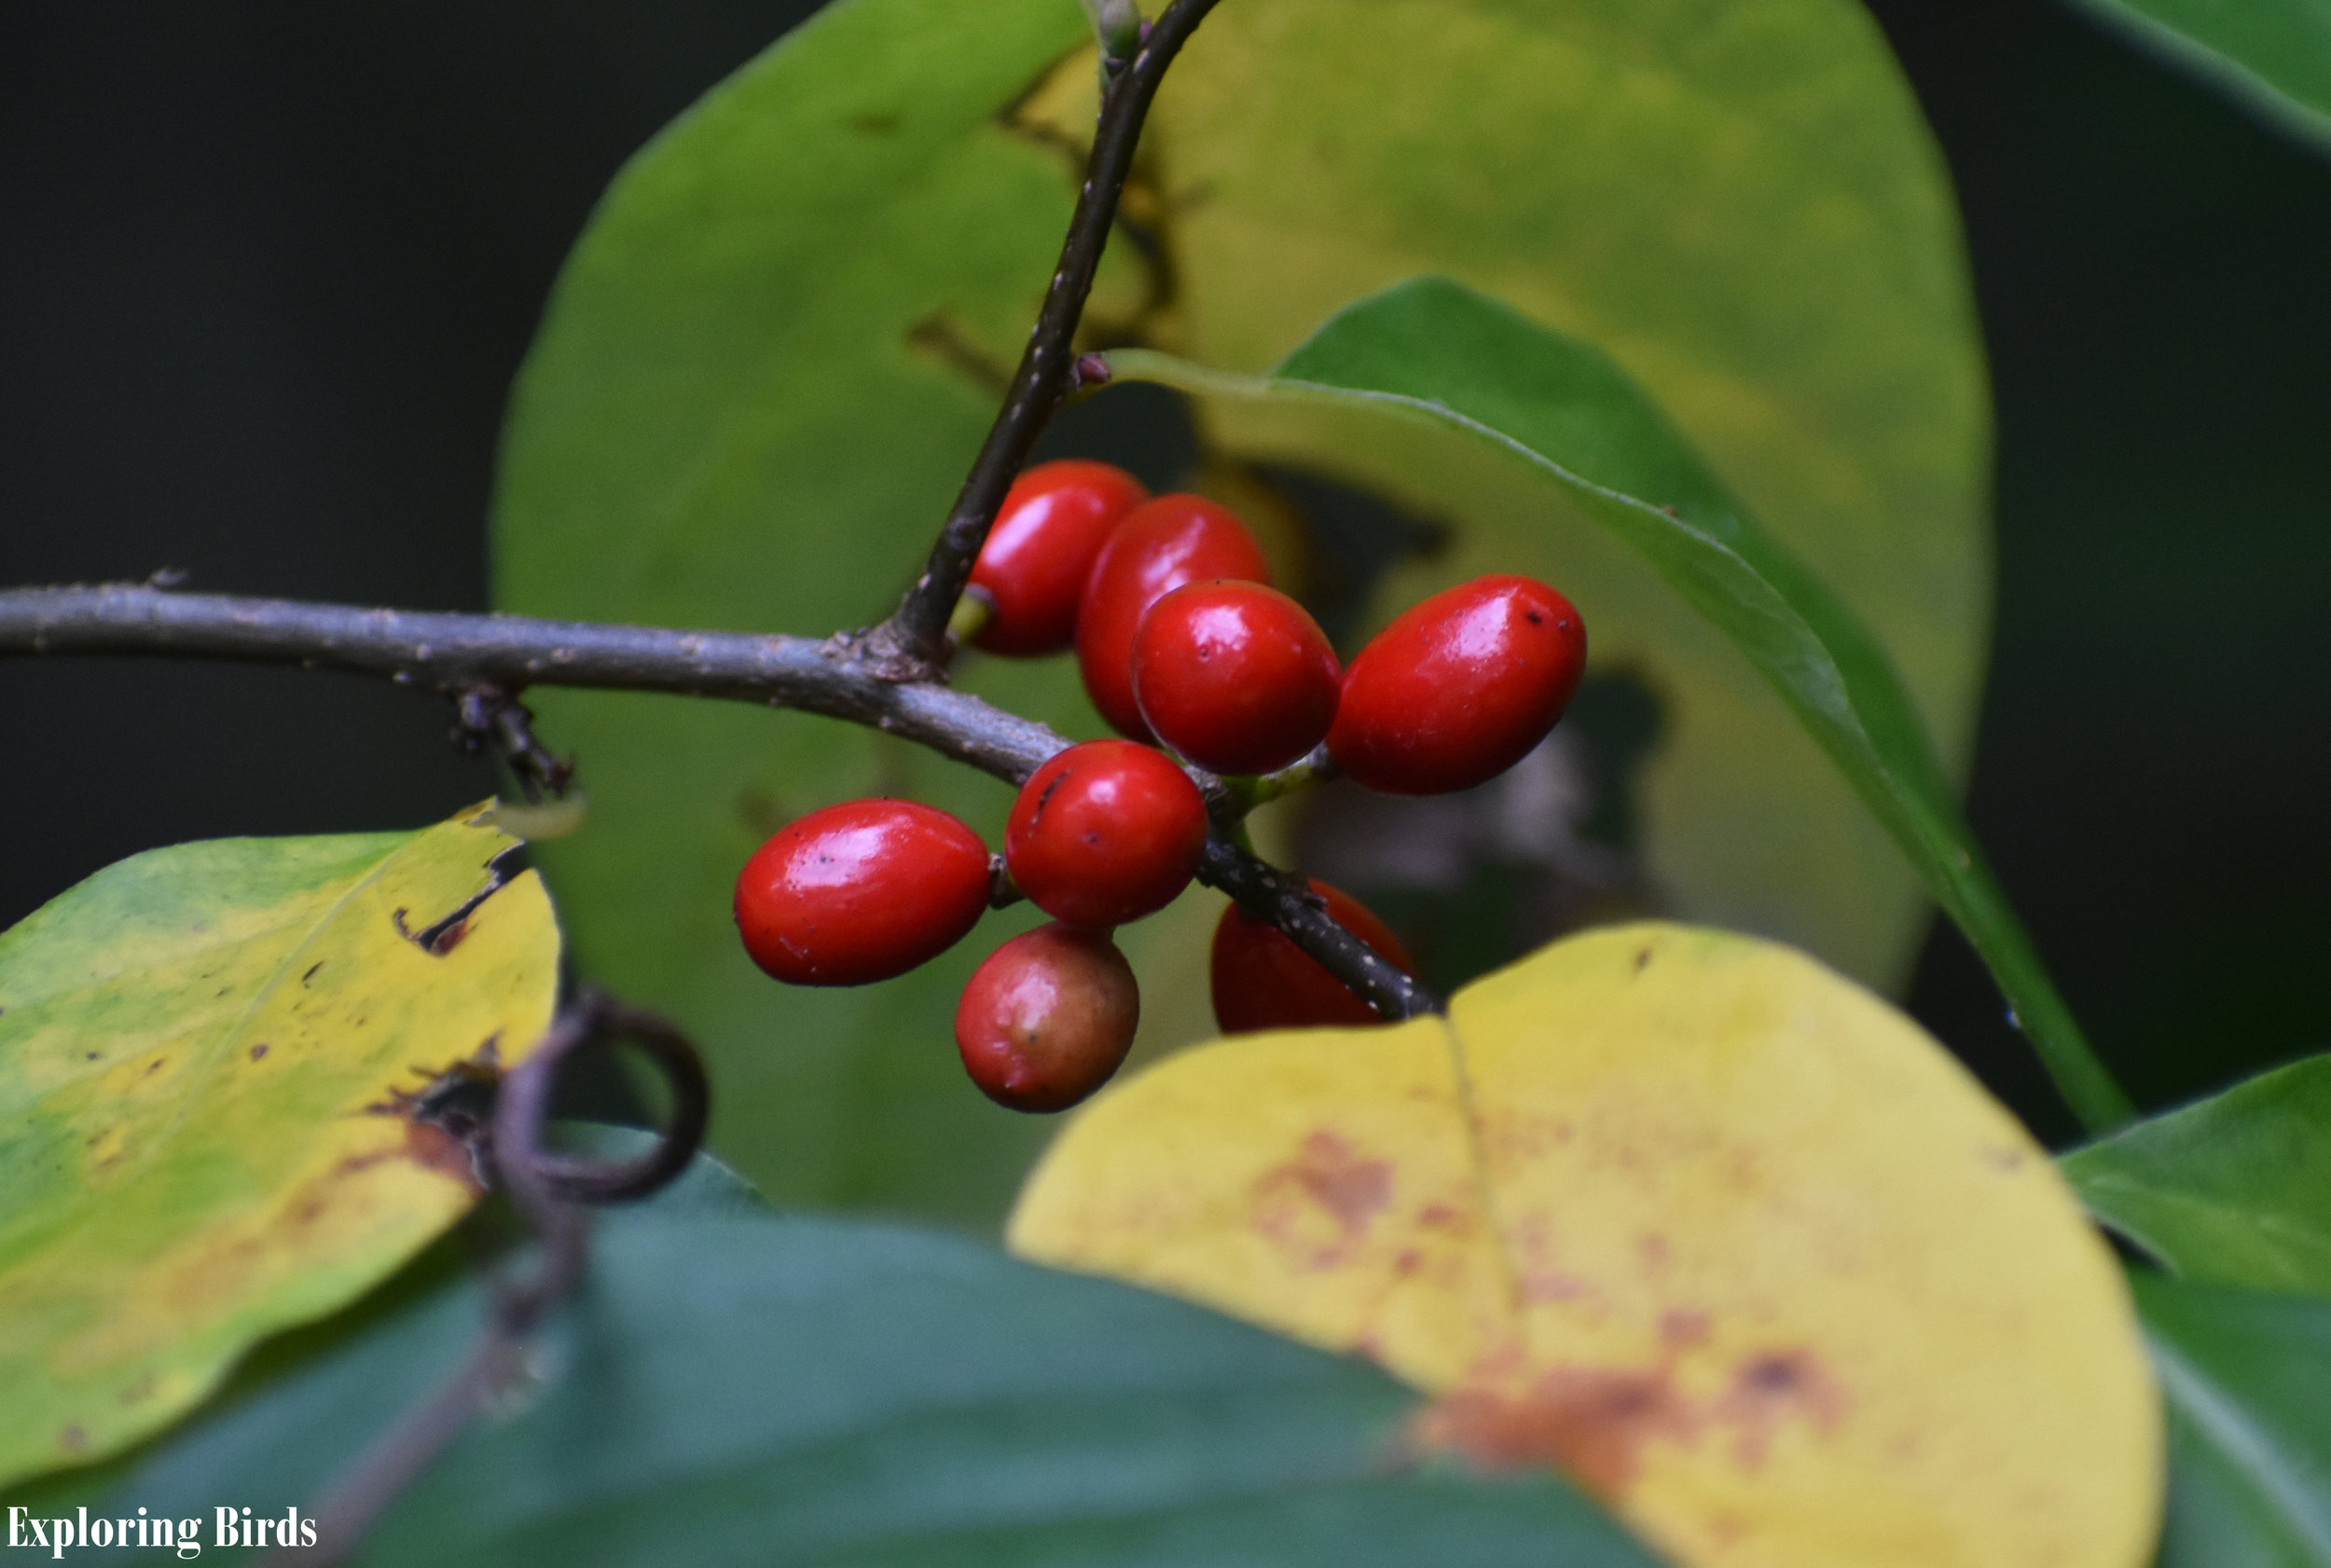 Spicebush is a shrub that attracts birds